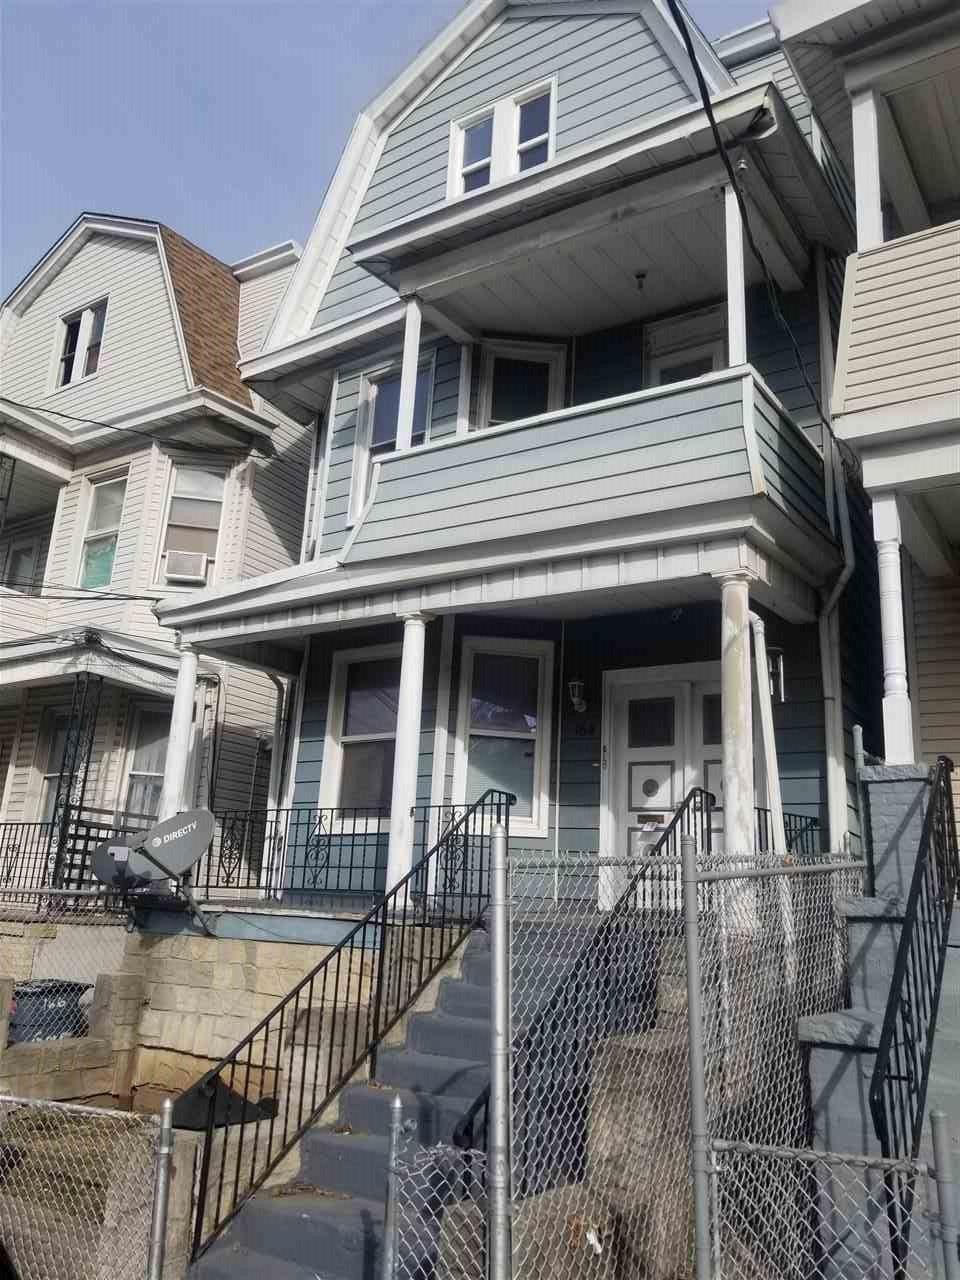 164 GRANT AVE, Jersey City, NJ 07305 - #: 202001842